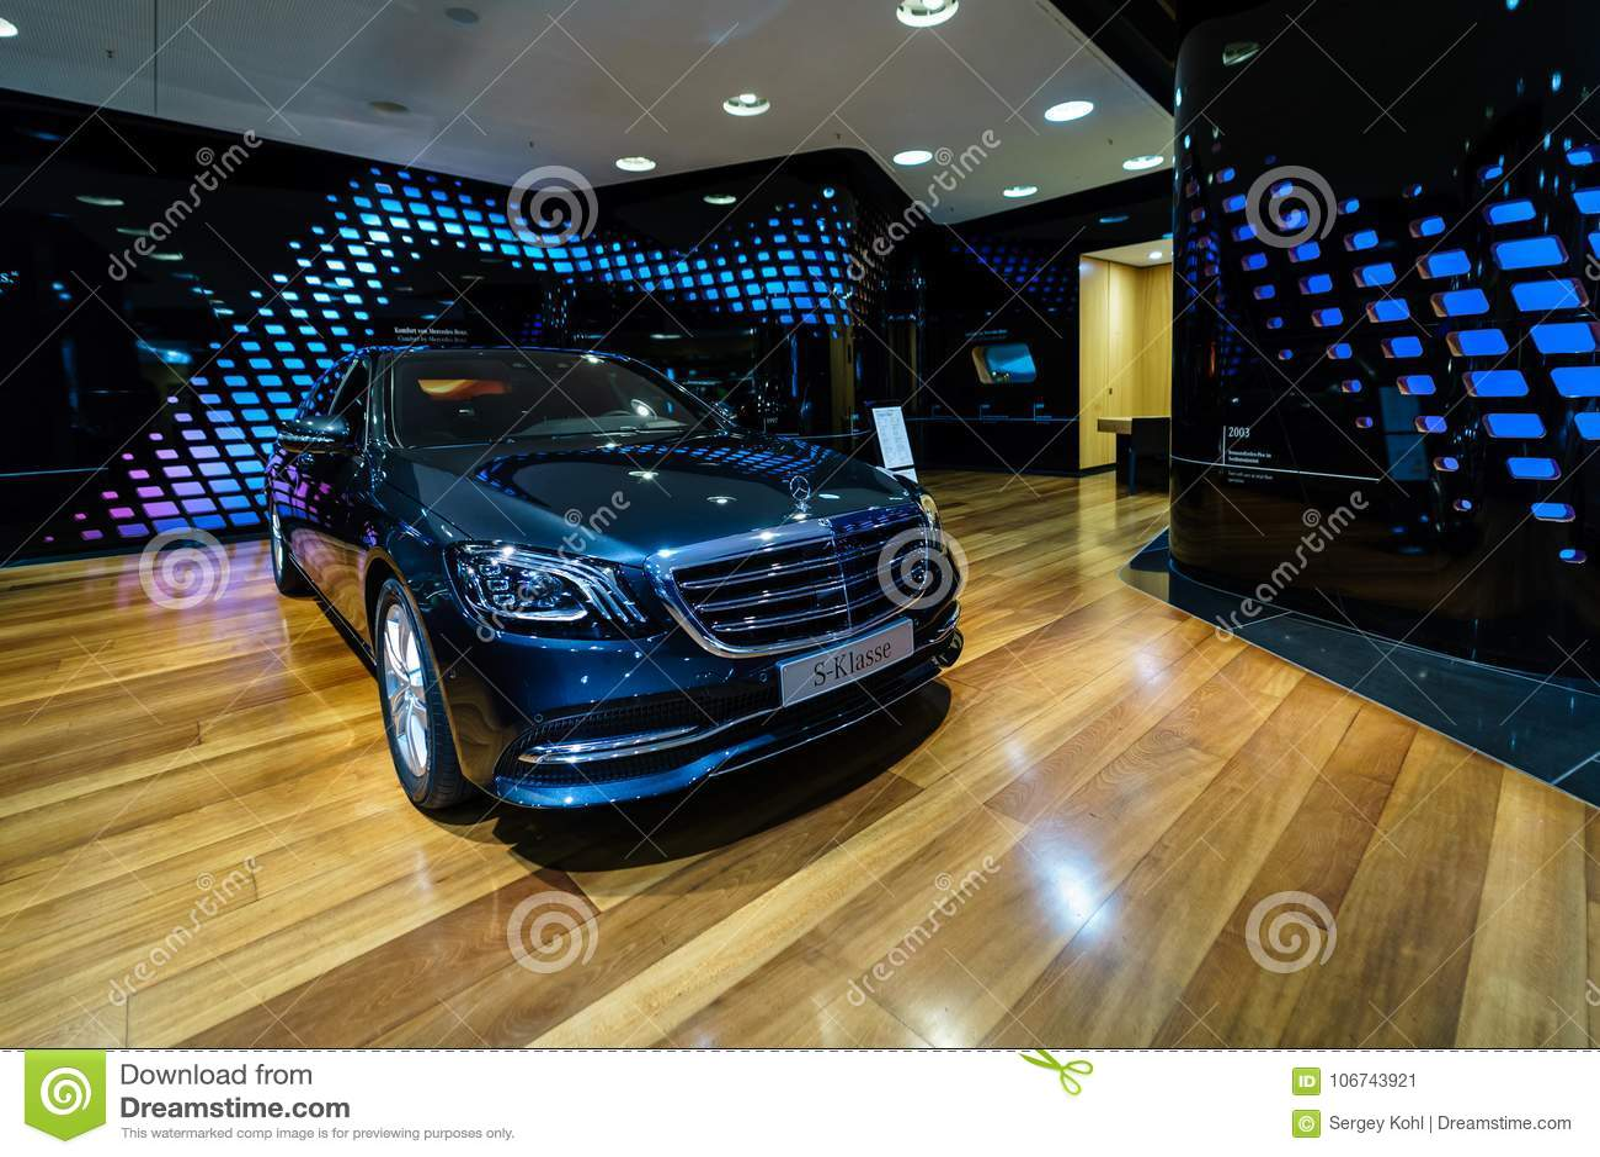 full-size luxury car mercedes-benz s-class s350d w222 facelift